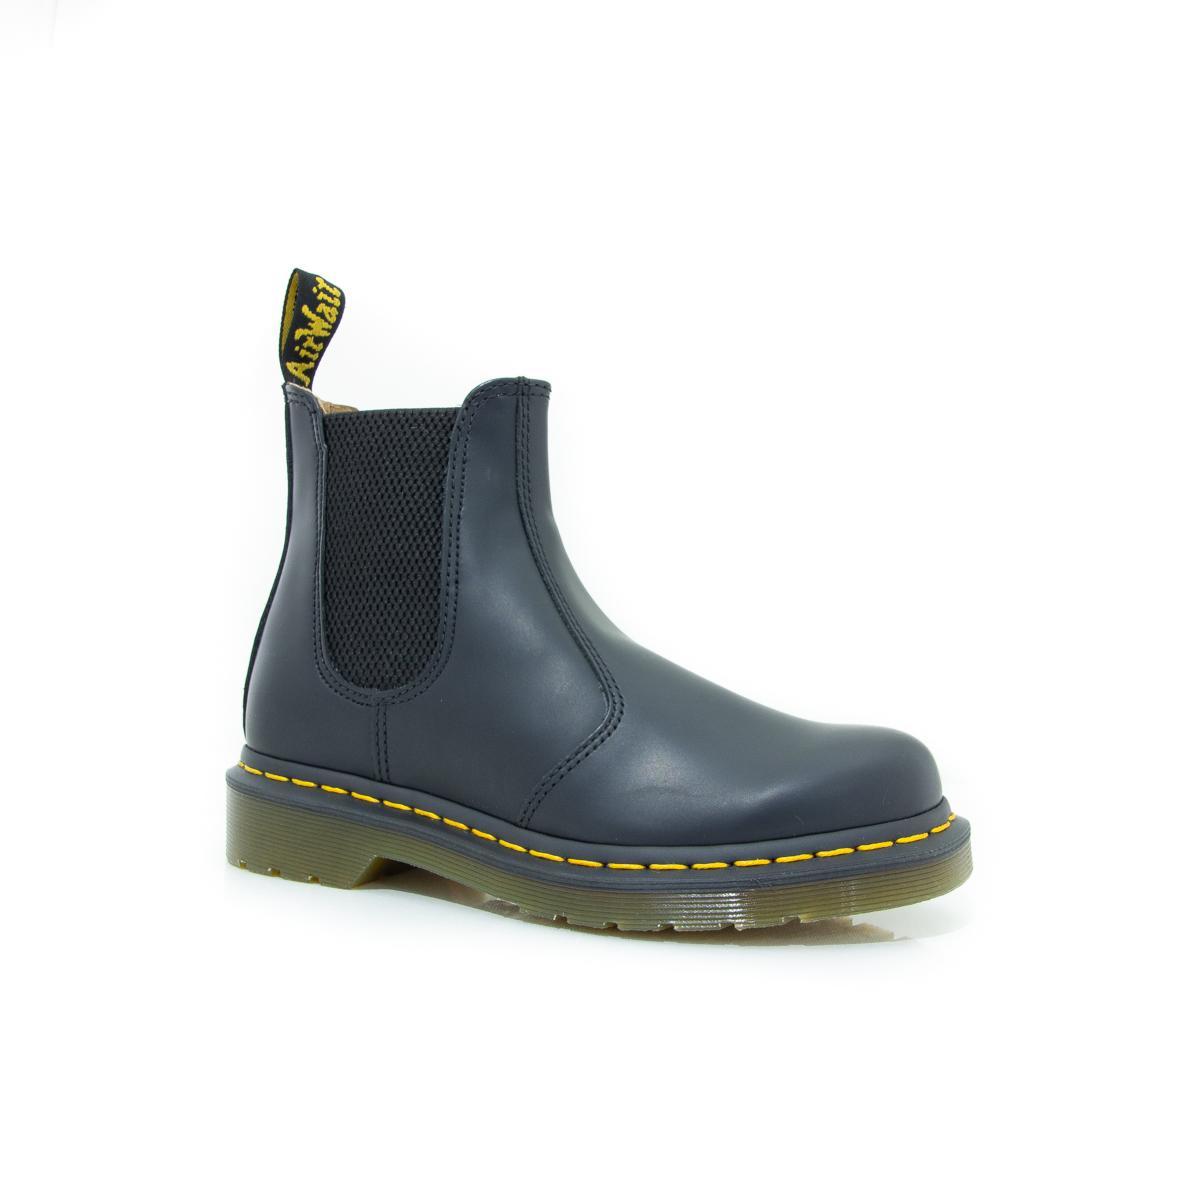 Dr Martens 2976 YS Chelsea Boot Black